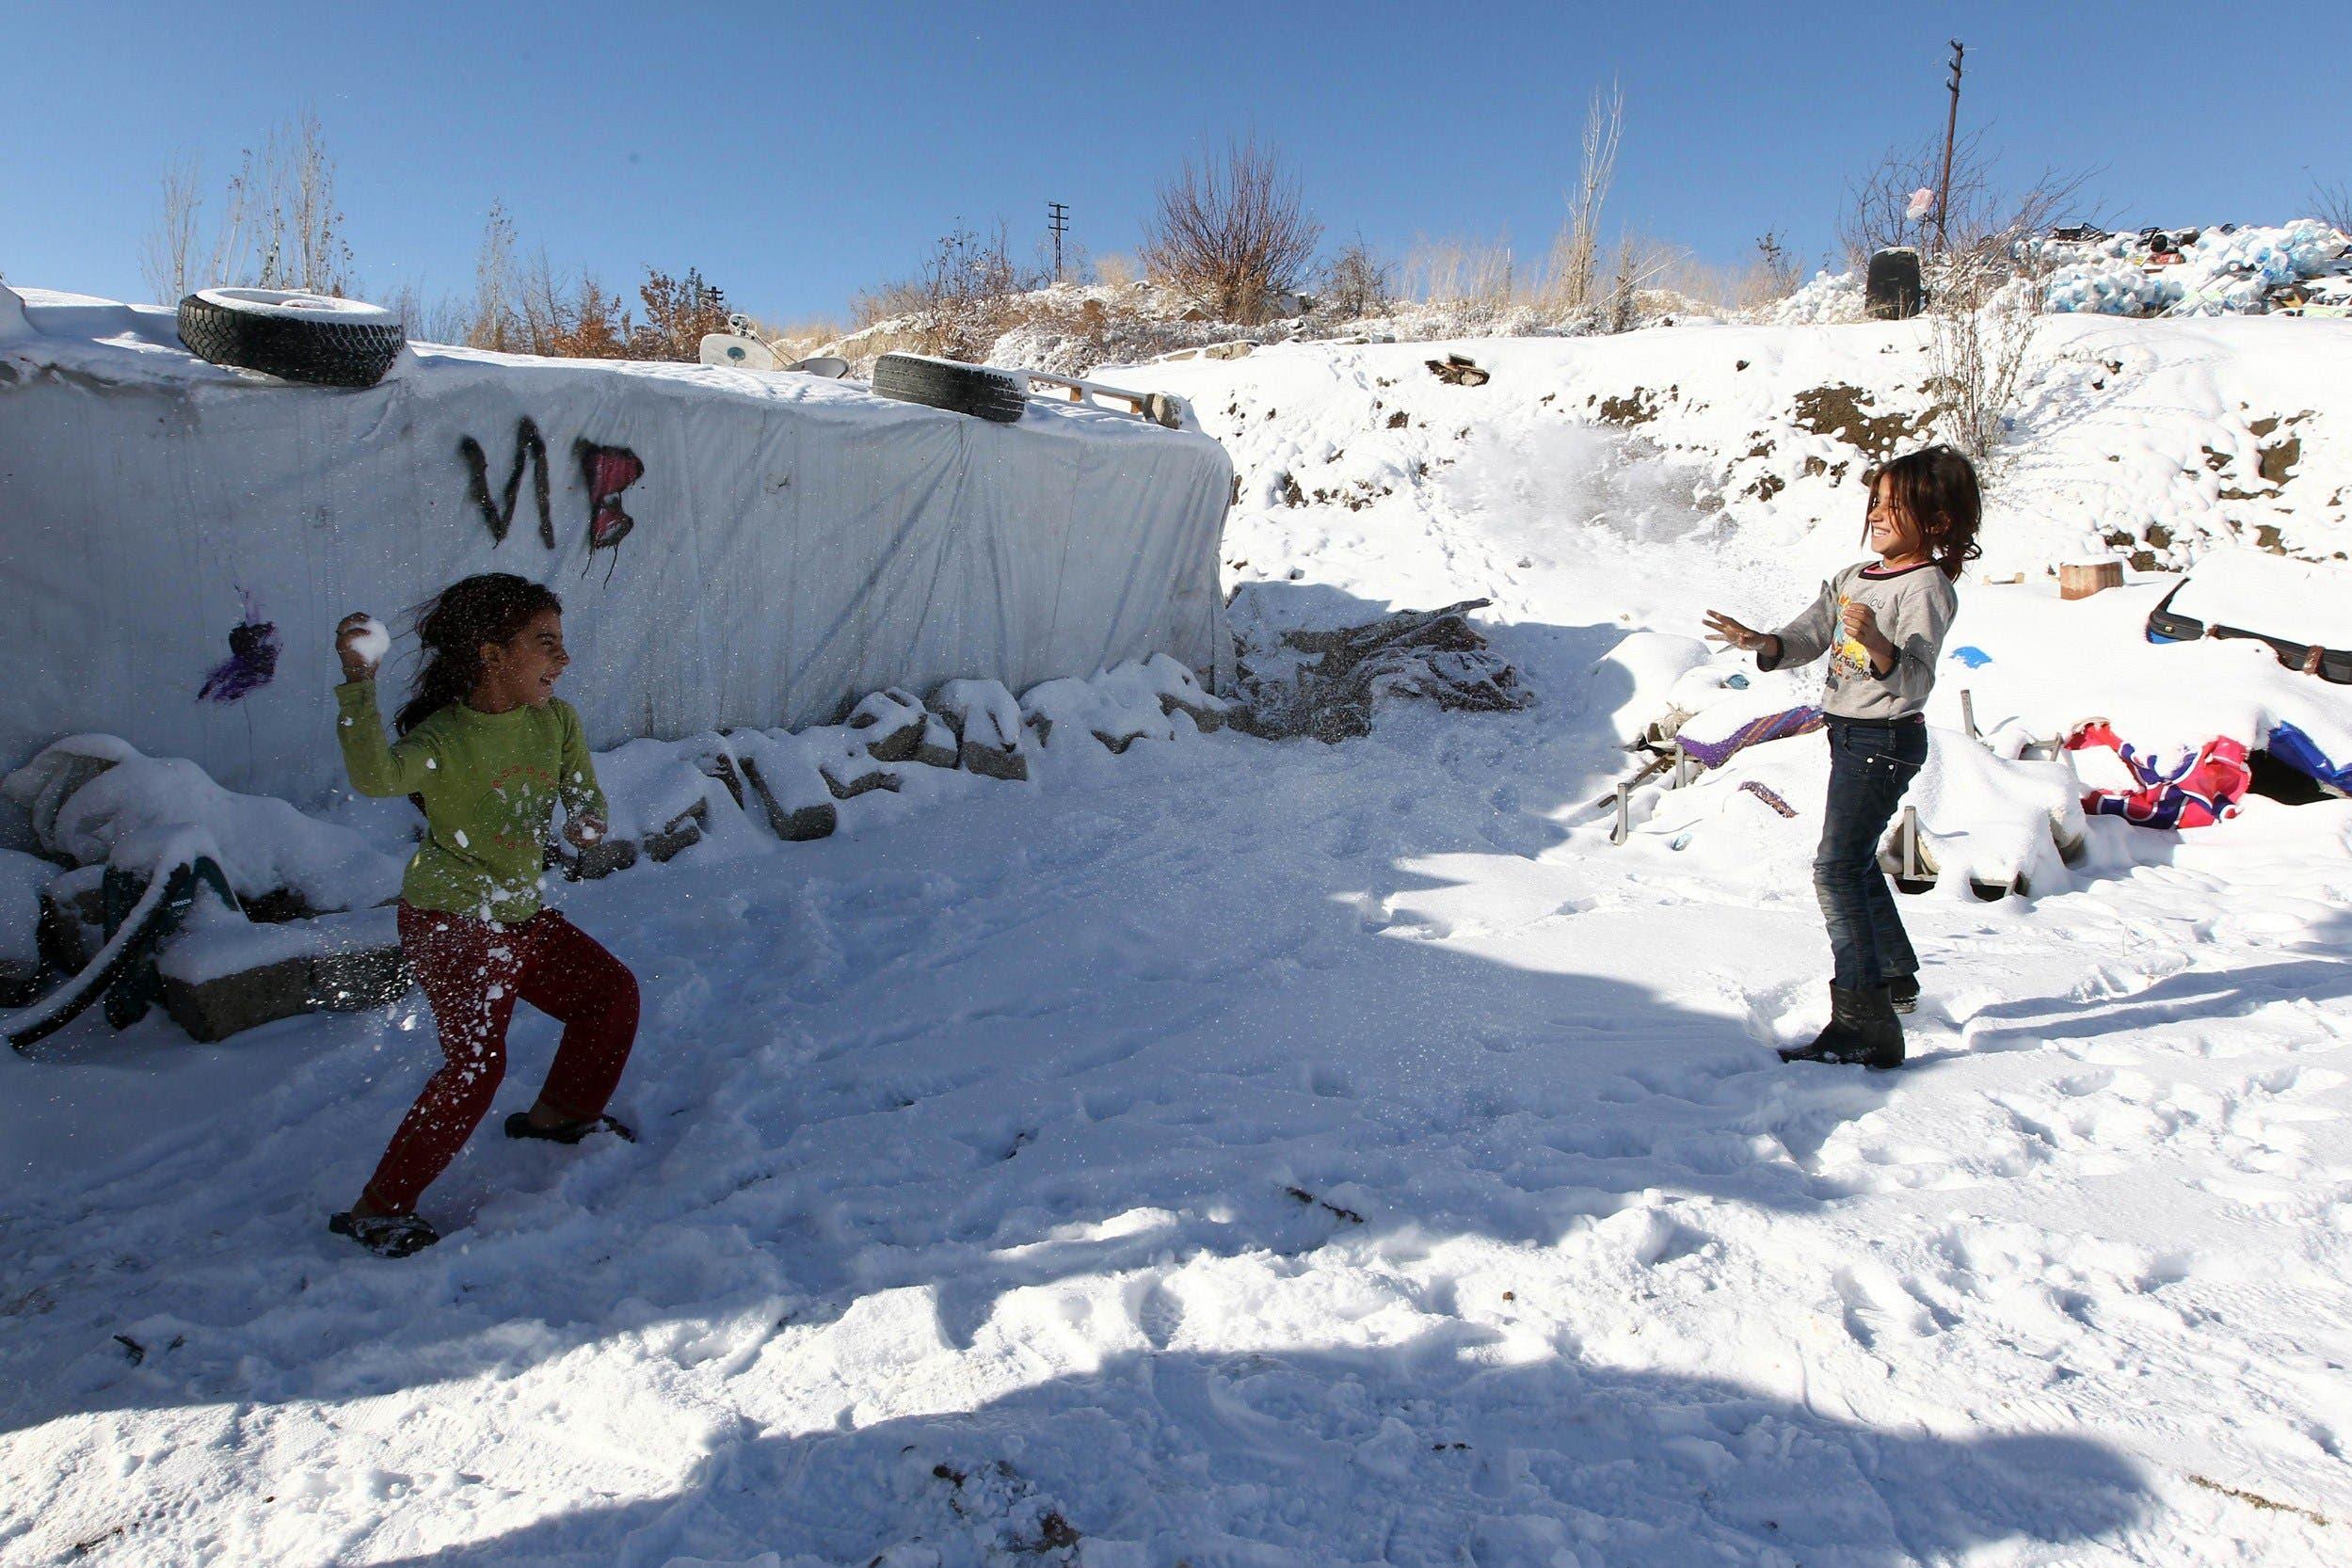 Syrian refugees smile despite heavy snowfall